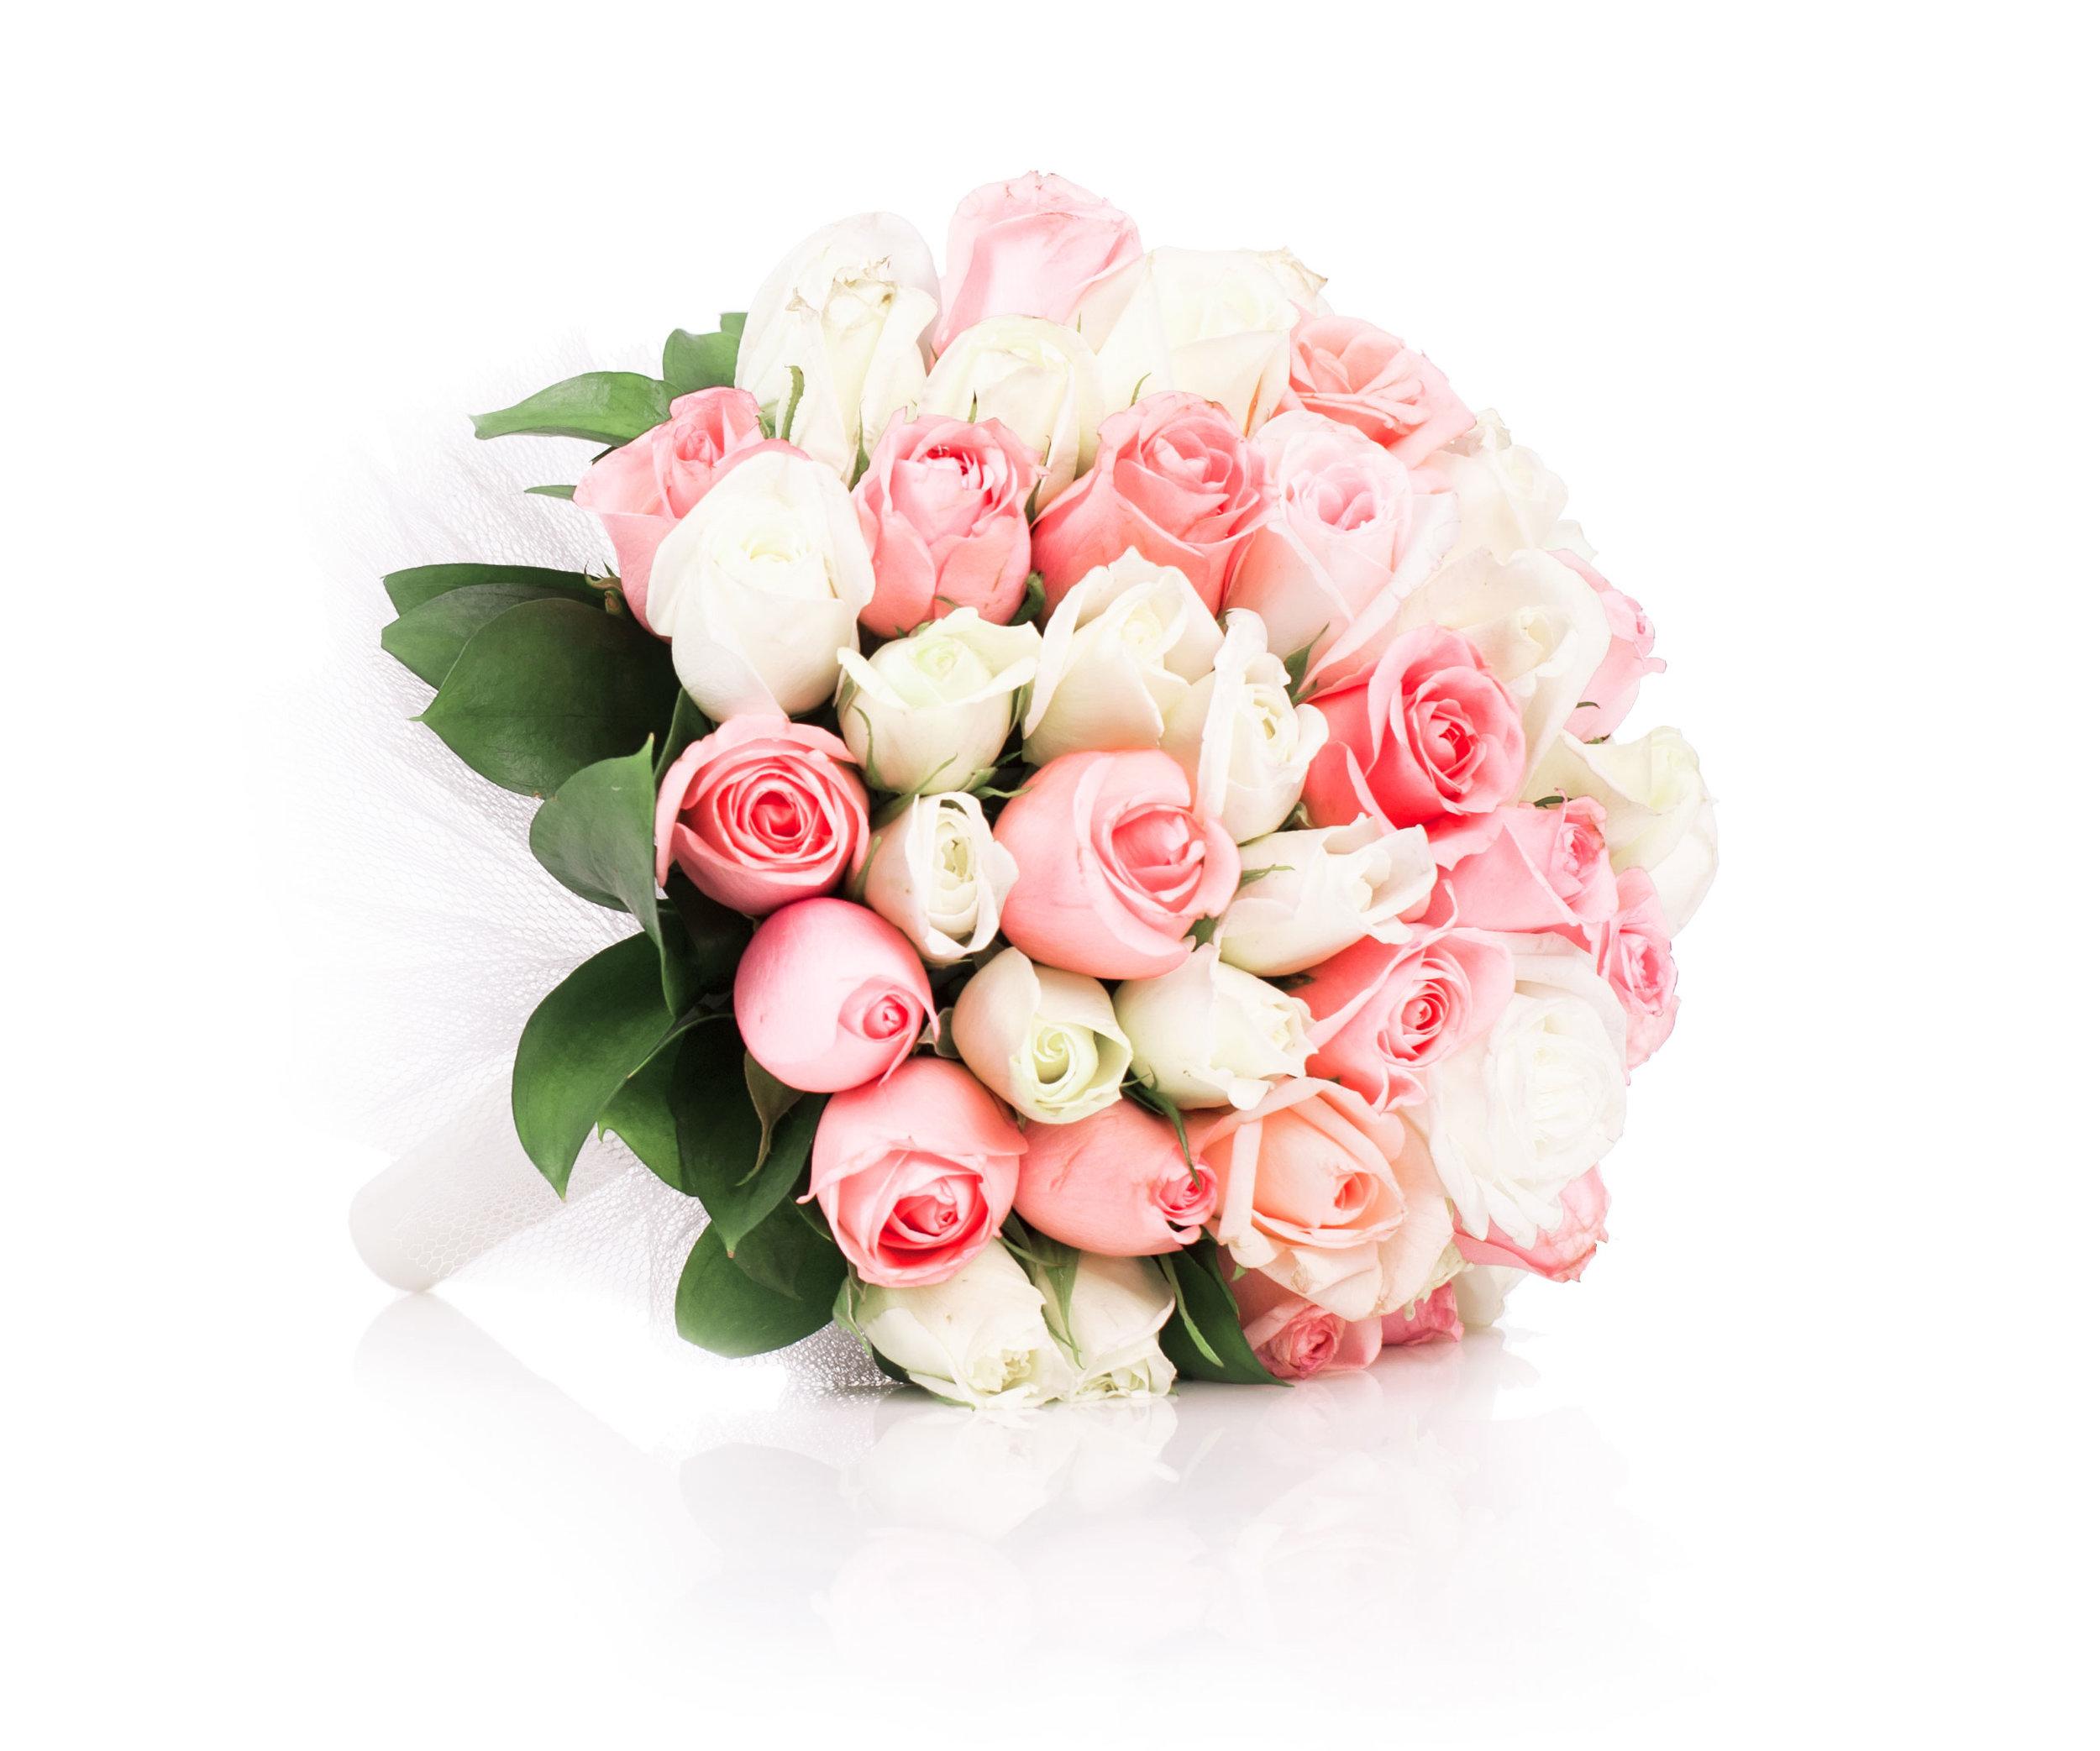 Gallant_barnbellsprings_flowers.jpg